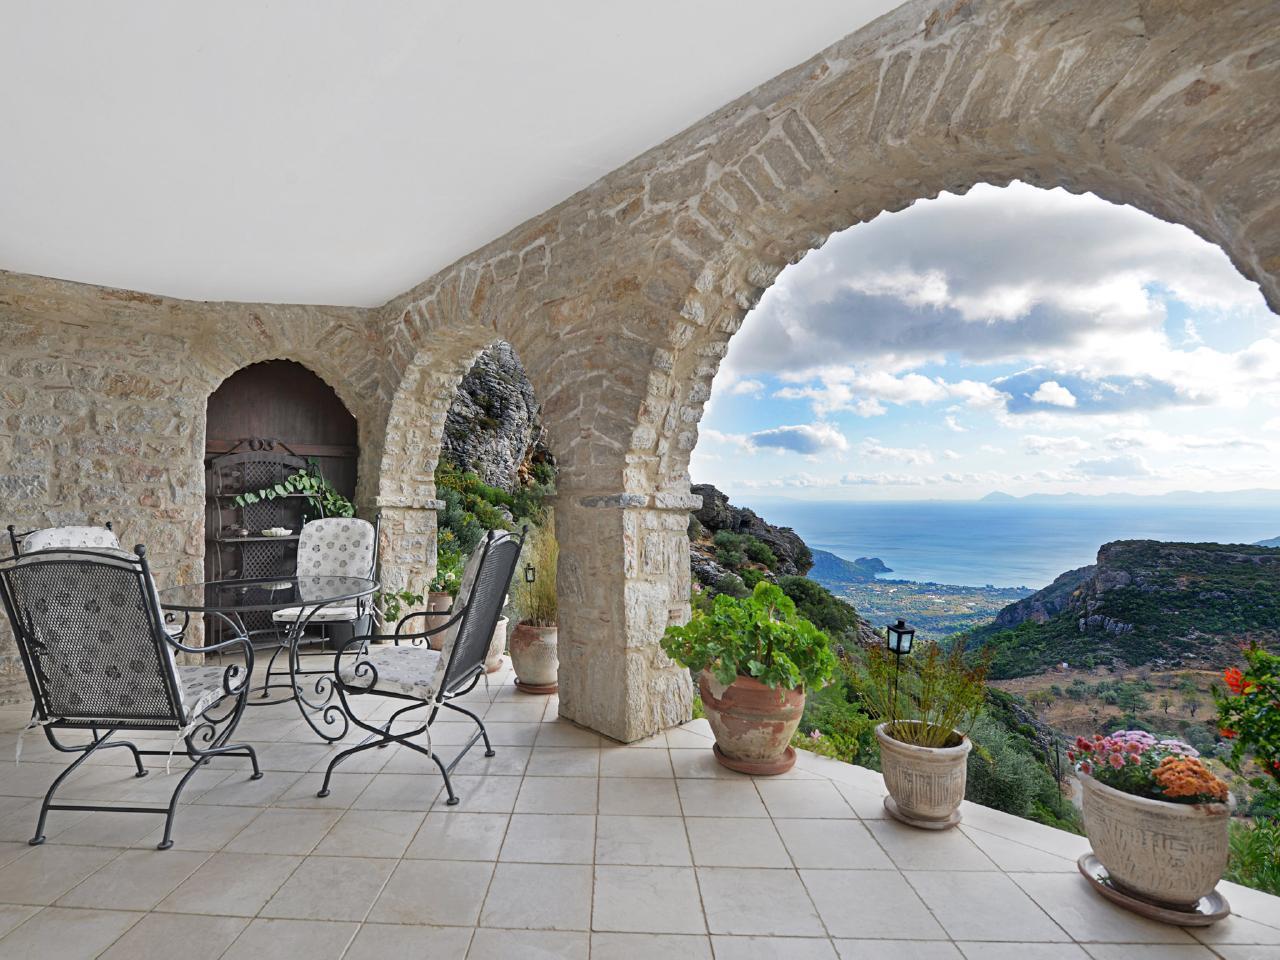 Maison de vacances Exklusives Chalet, romantisch am Berghang und Meer gelegen (2506674), Mesudiye, , Région Egéenne, Turquie, image 14